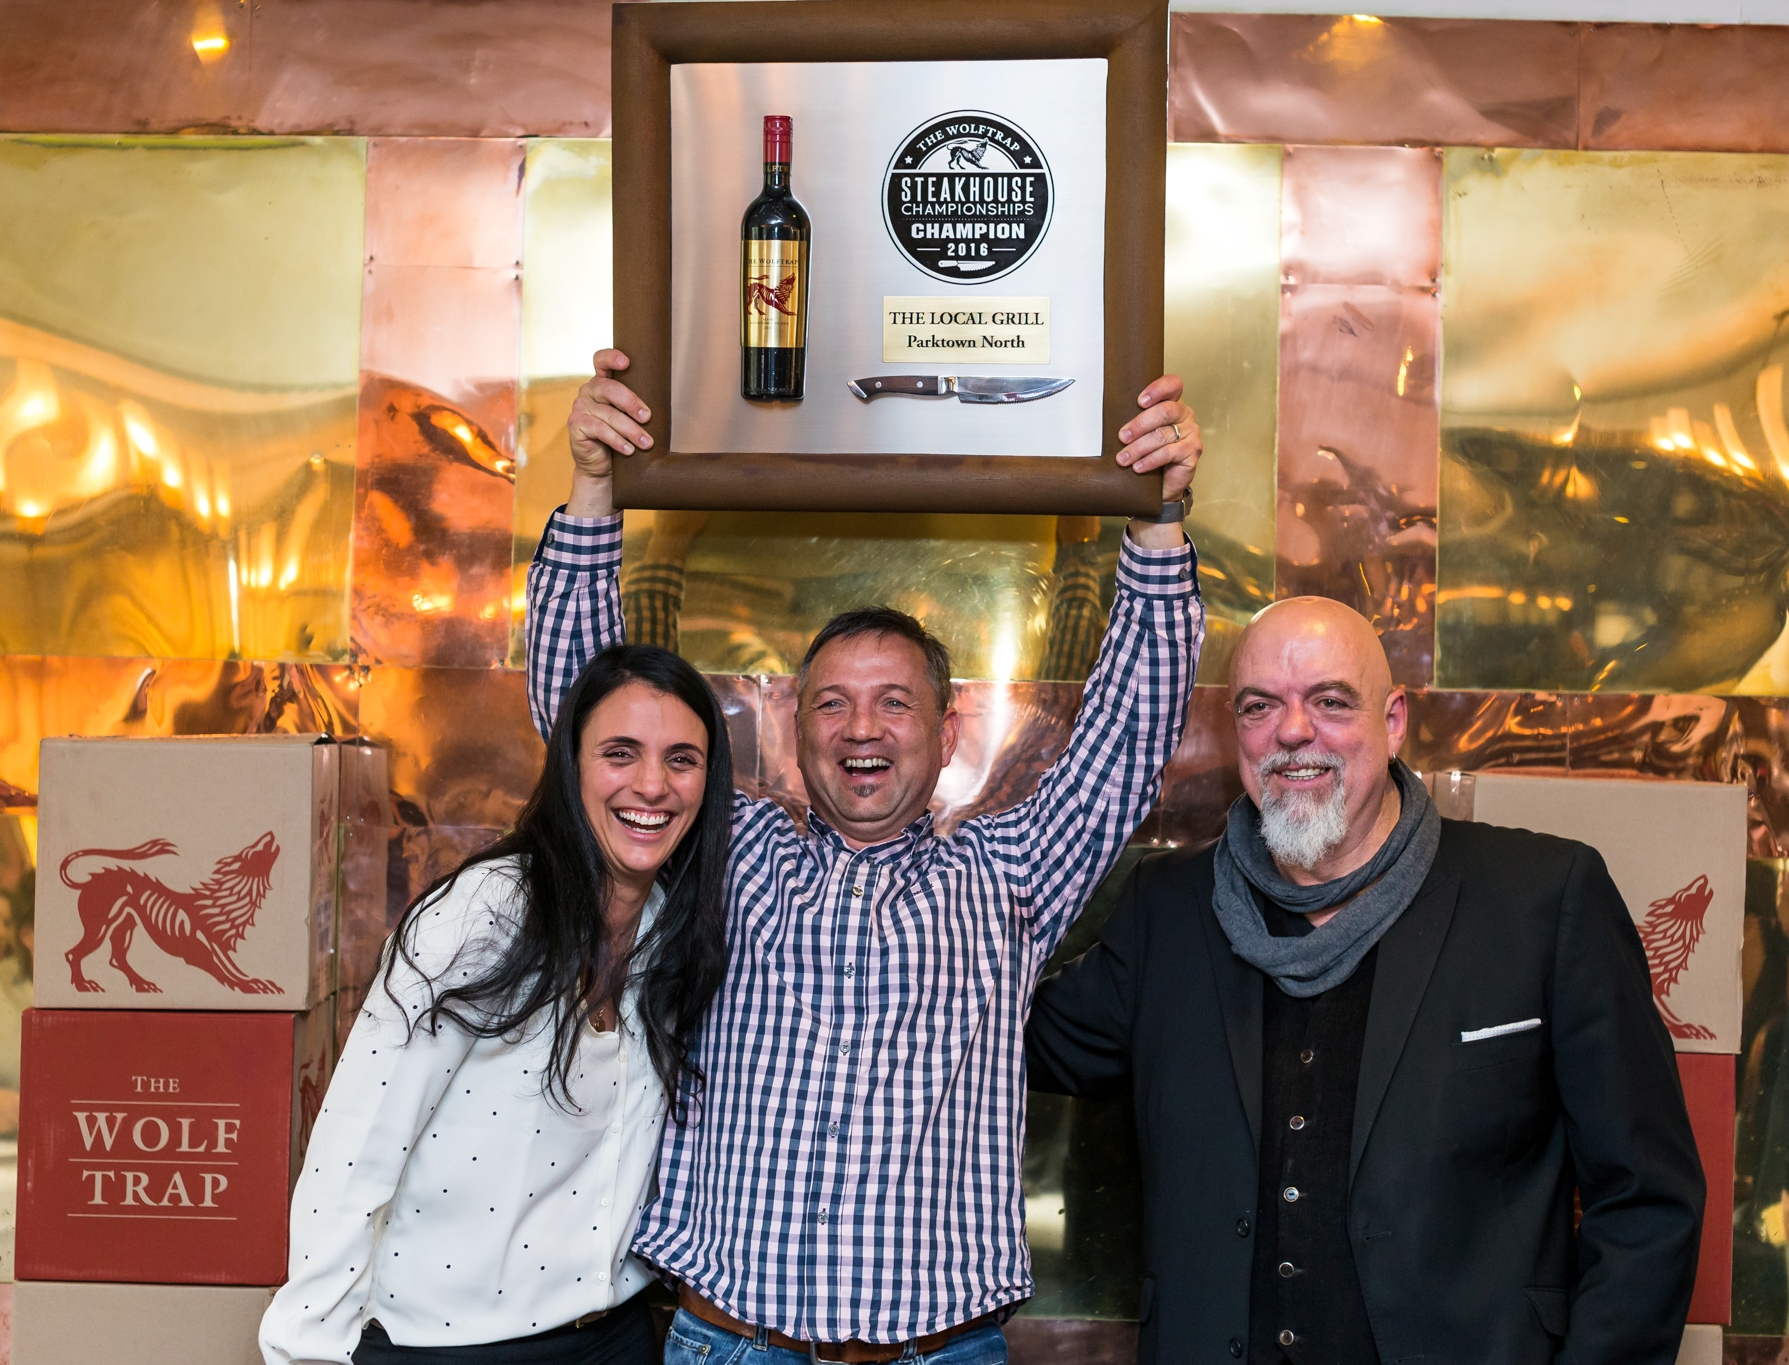 3) 2016 Champion The Local Grill Parktown North L to R Inge Hoffmann, Steve Maresch, Pete Goffe-Wood